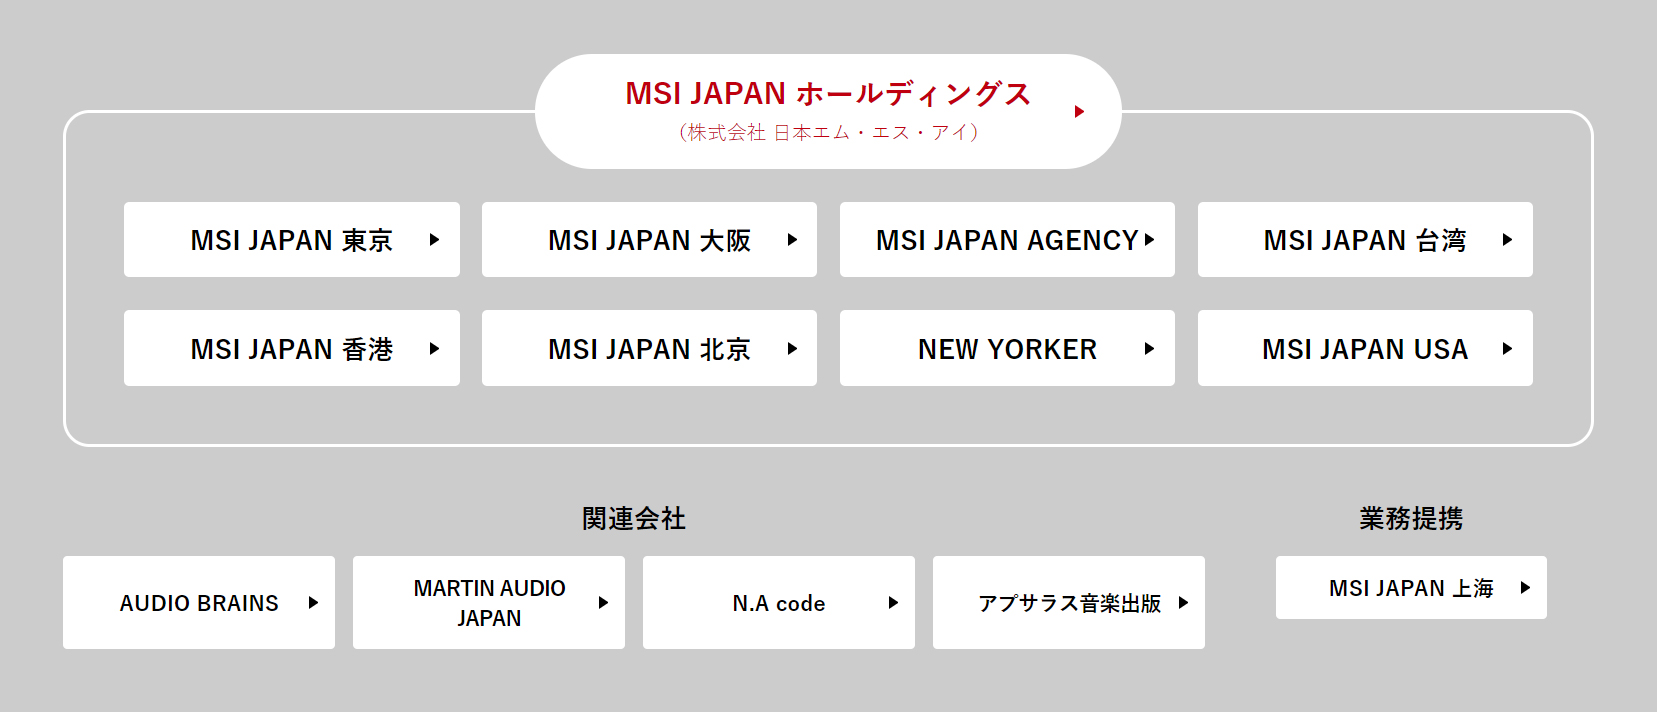 MSI JAPANグループの関連会社